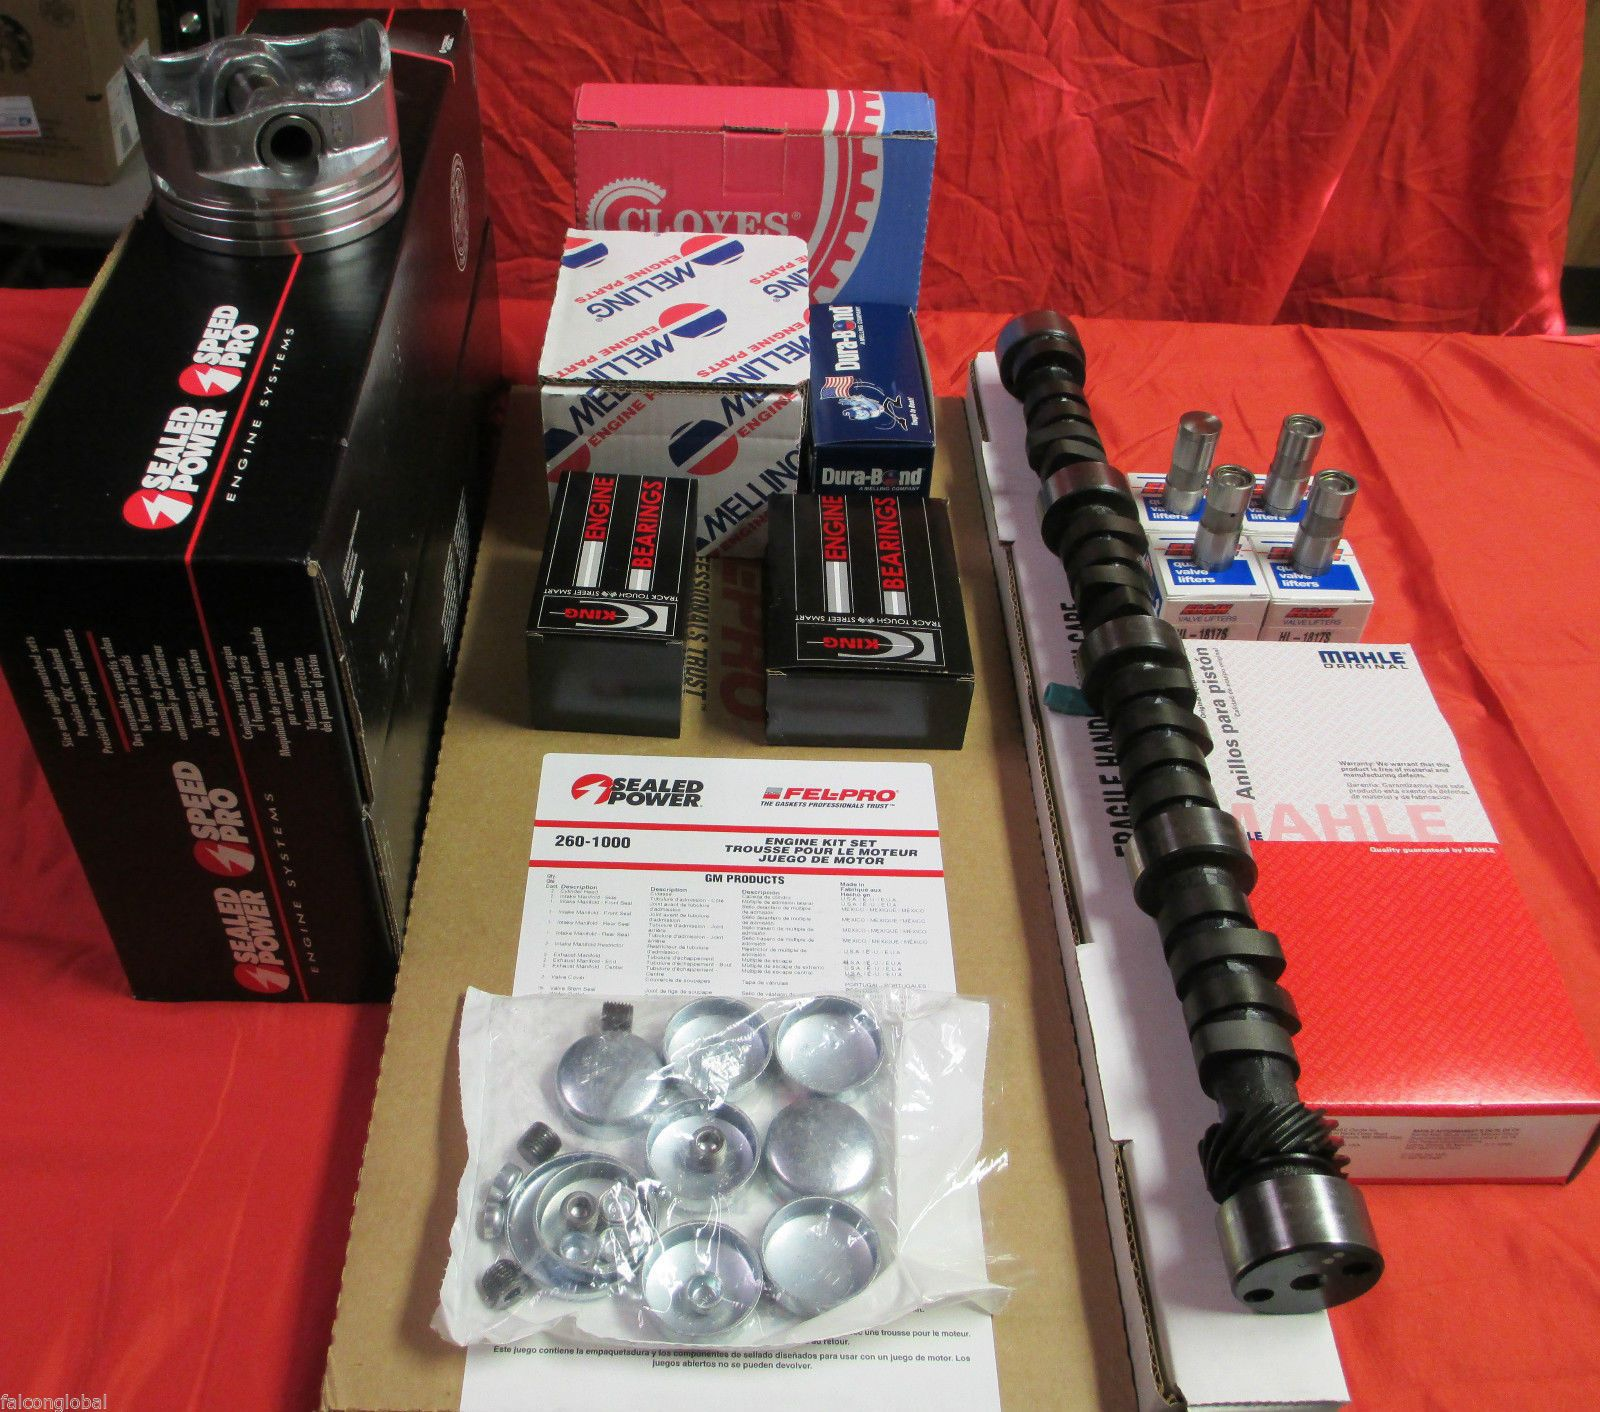 Mercruiser seawater raw water pump stainless steel wearplate repair - Sherwood Pump Major Repair Kit 23981 Less Cam Gc1 Gc4 Gc5 W Lip Seal 10514 Inboard Engines And Components Pinterest